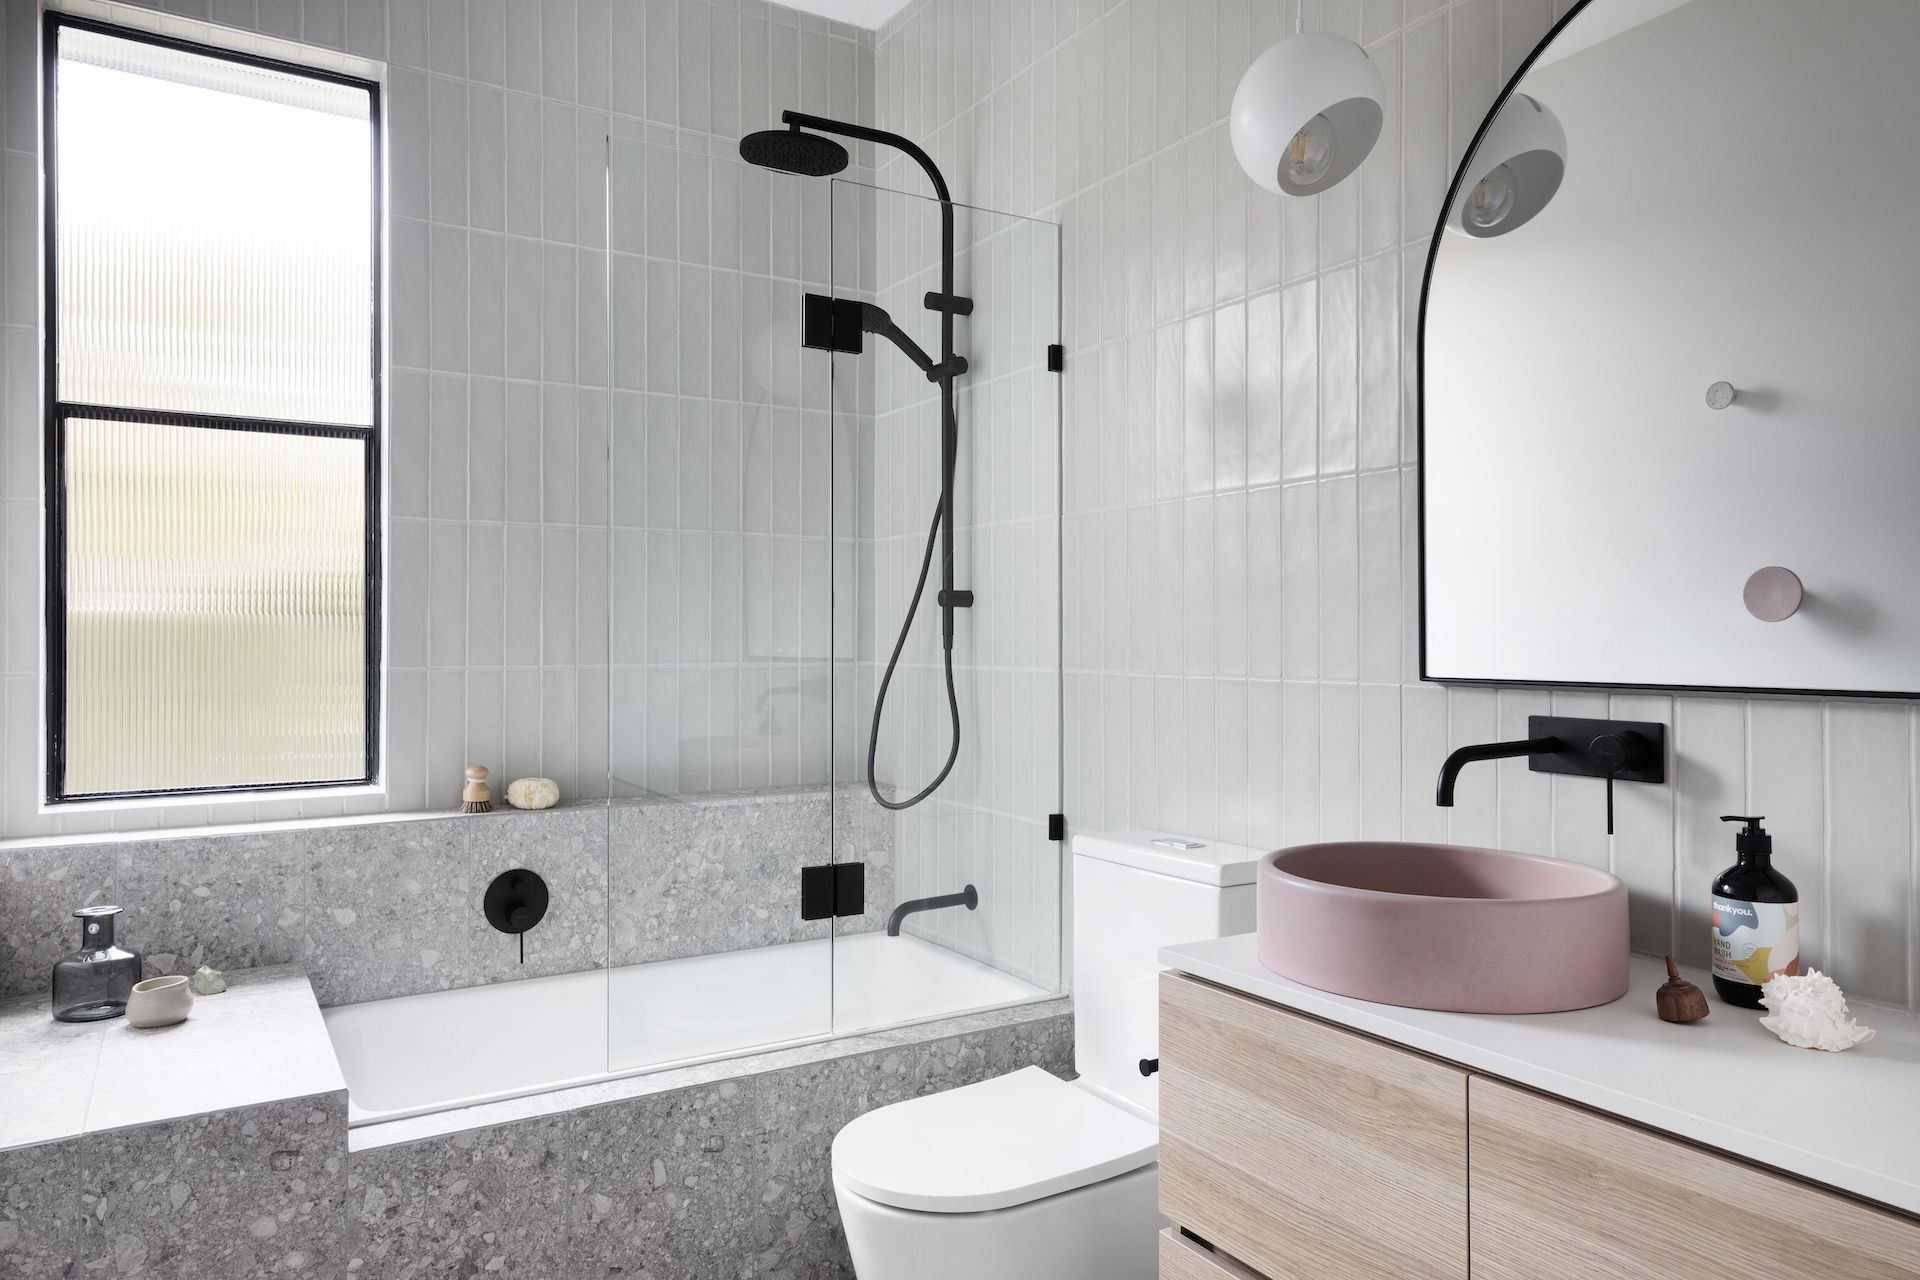 nood co round coloured bathroom basin in chic grey bathroom with black taps